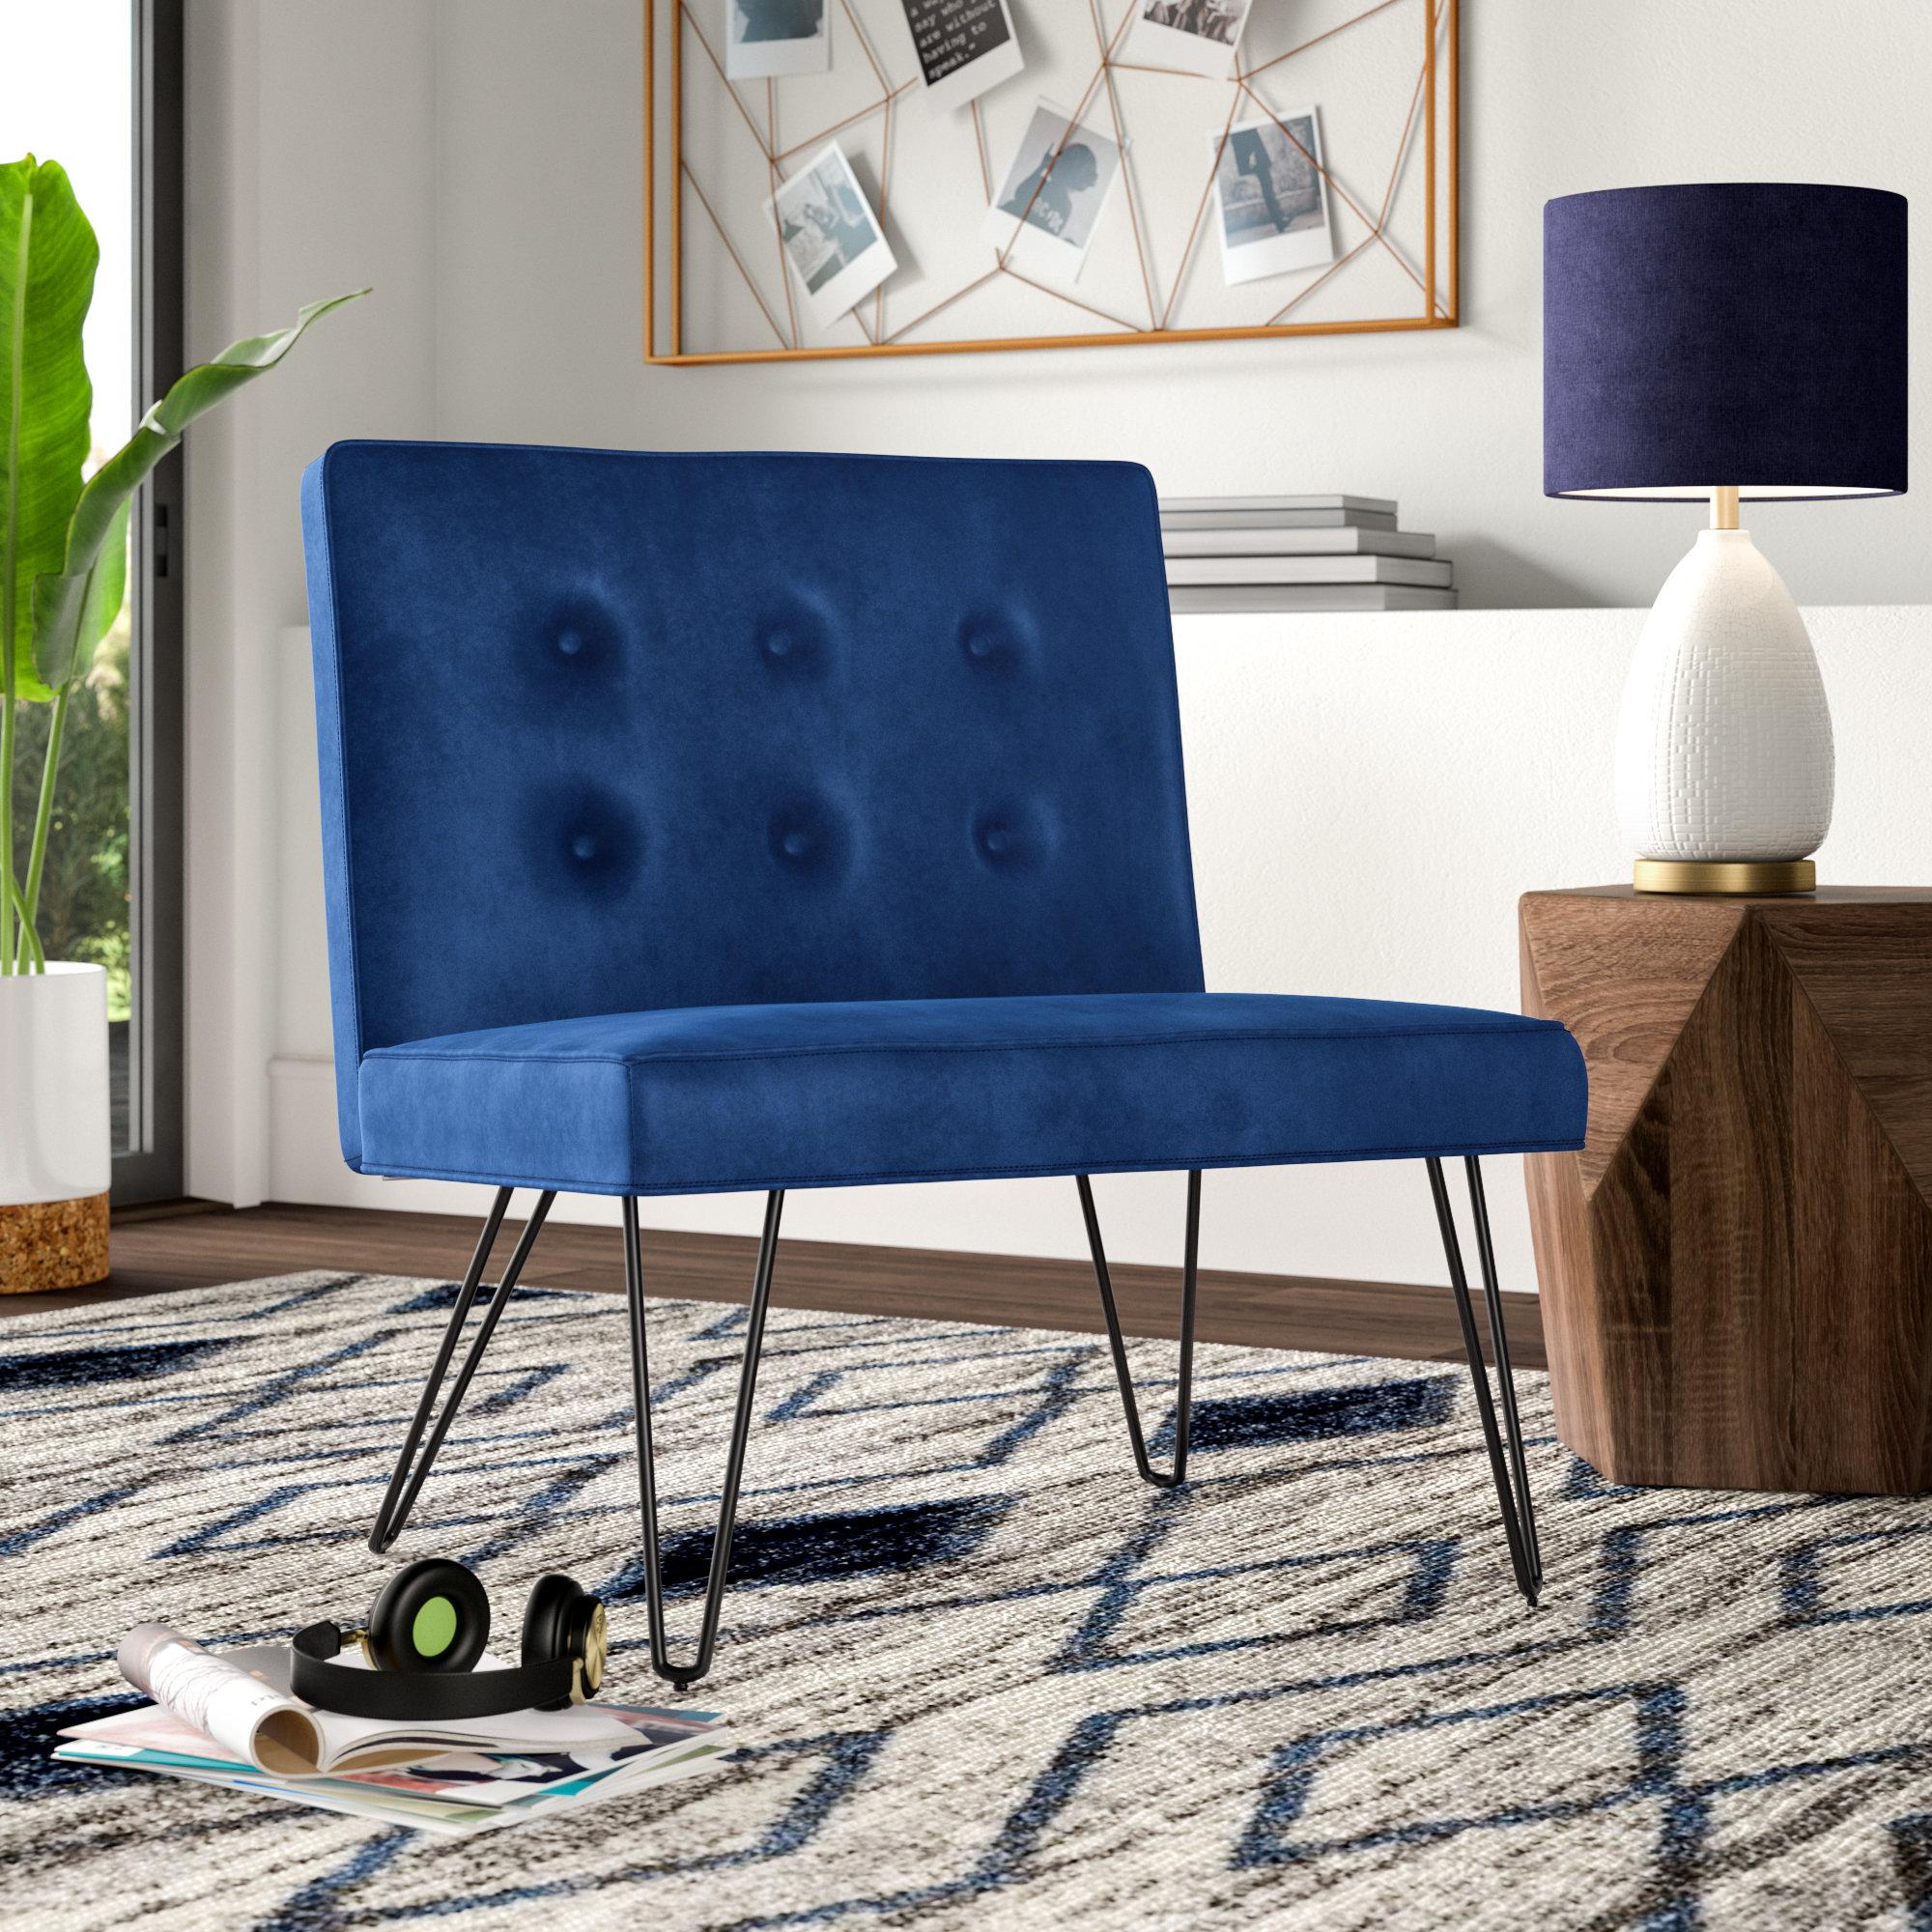 Peachy Mercury Row Lininger Slipper Chair Reviews Wayfair Caraccident5 Cool Chair Designs And Ideas Caraccident5Info